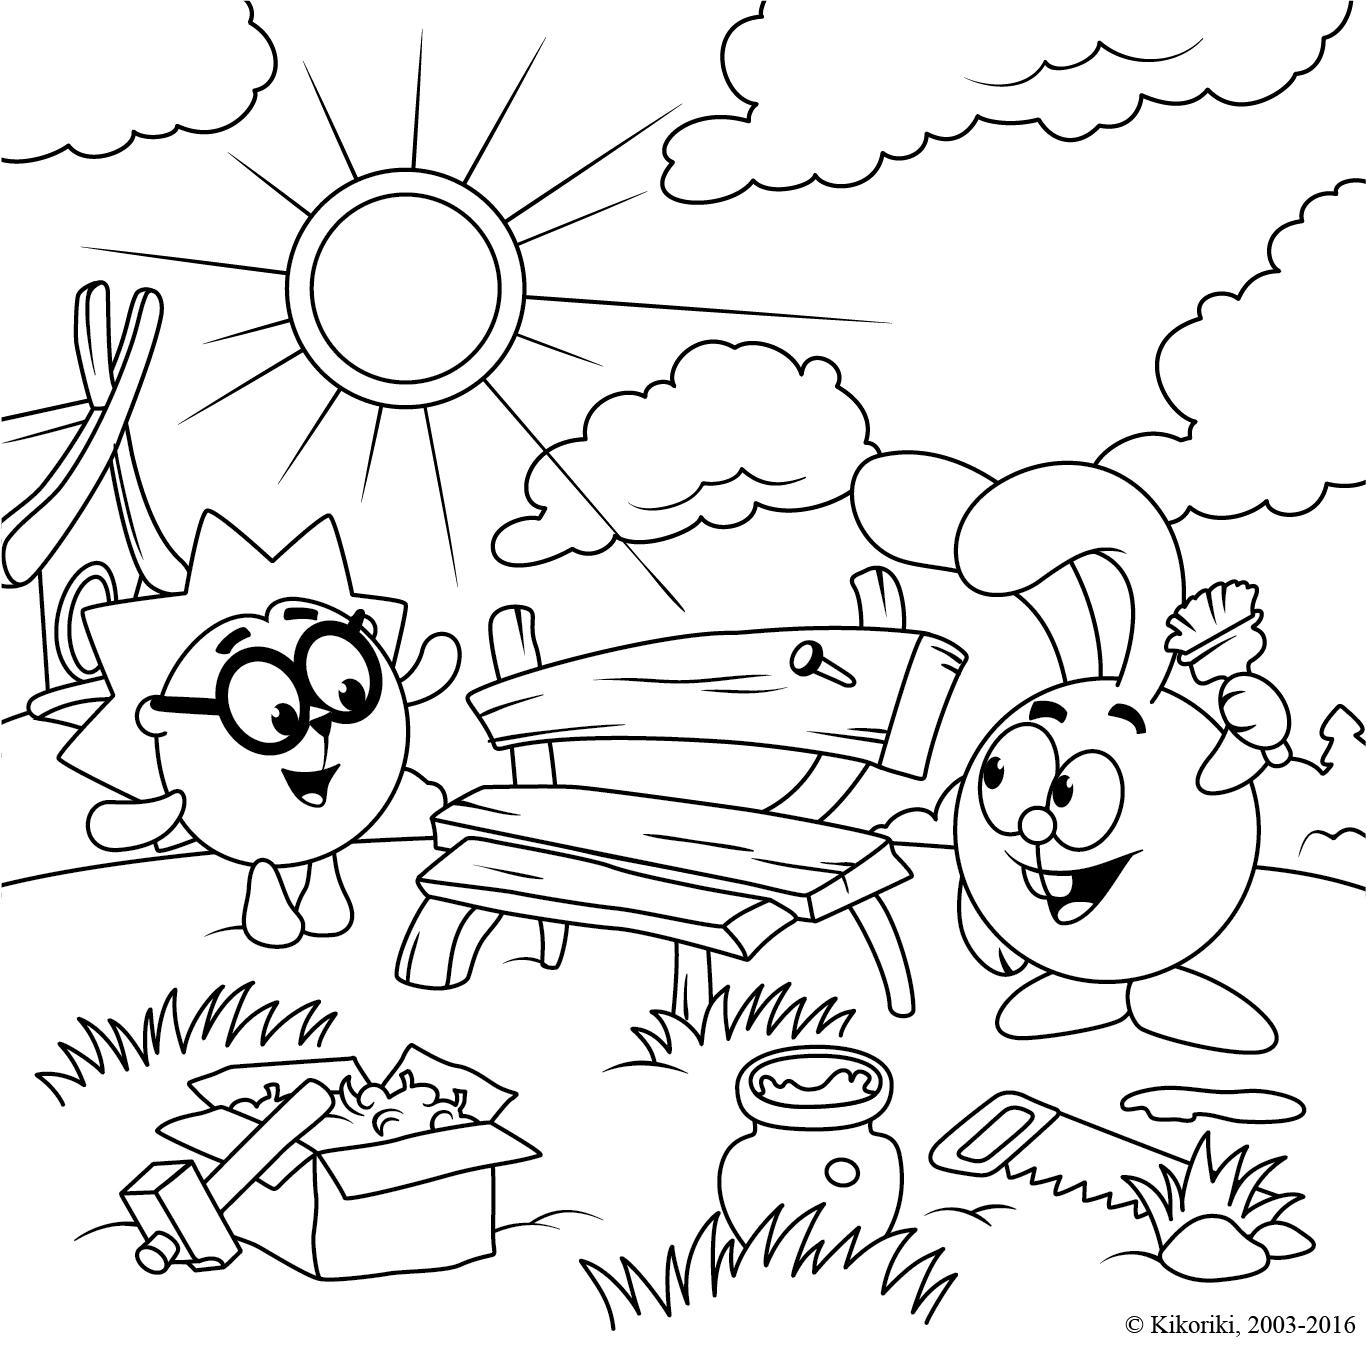 Раскраска Смешарики, Ежик и Крош построили скамейку ...